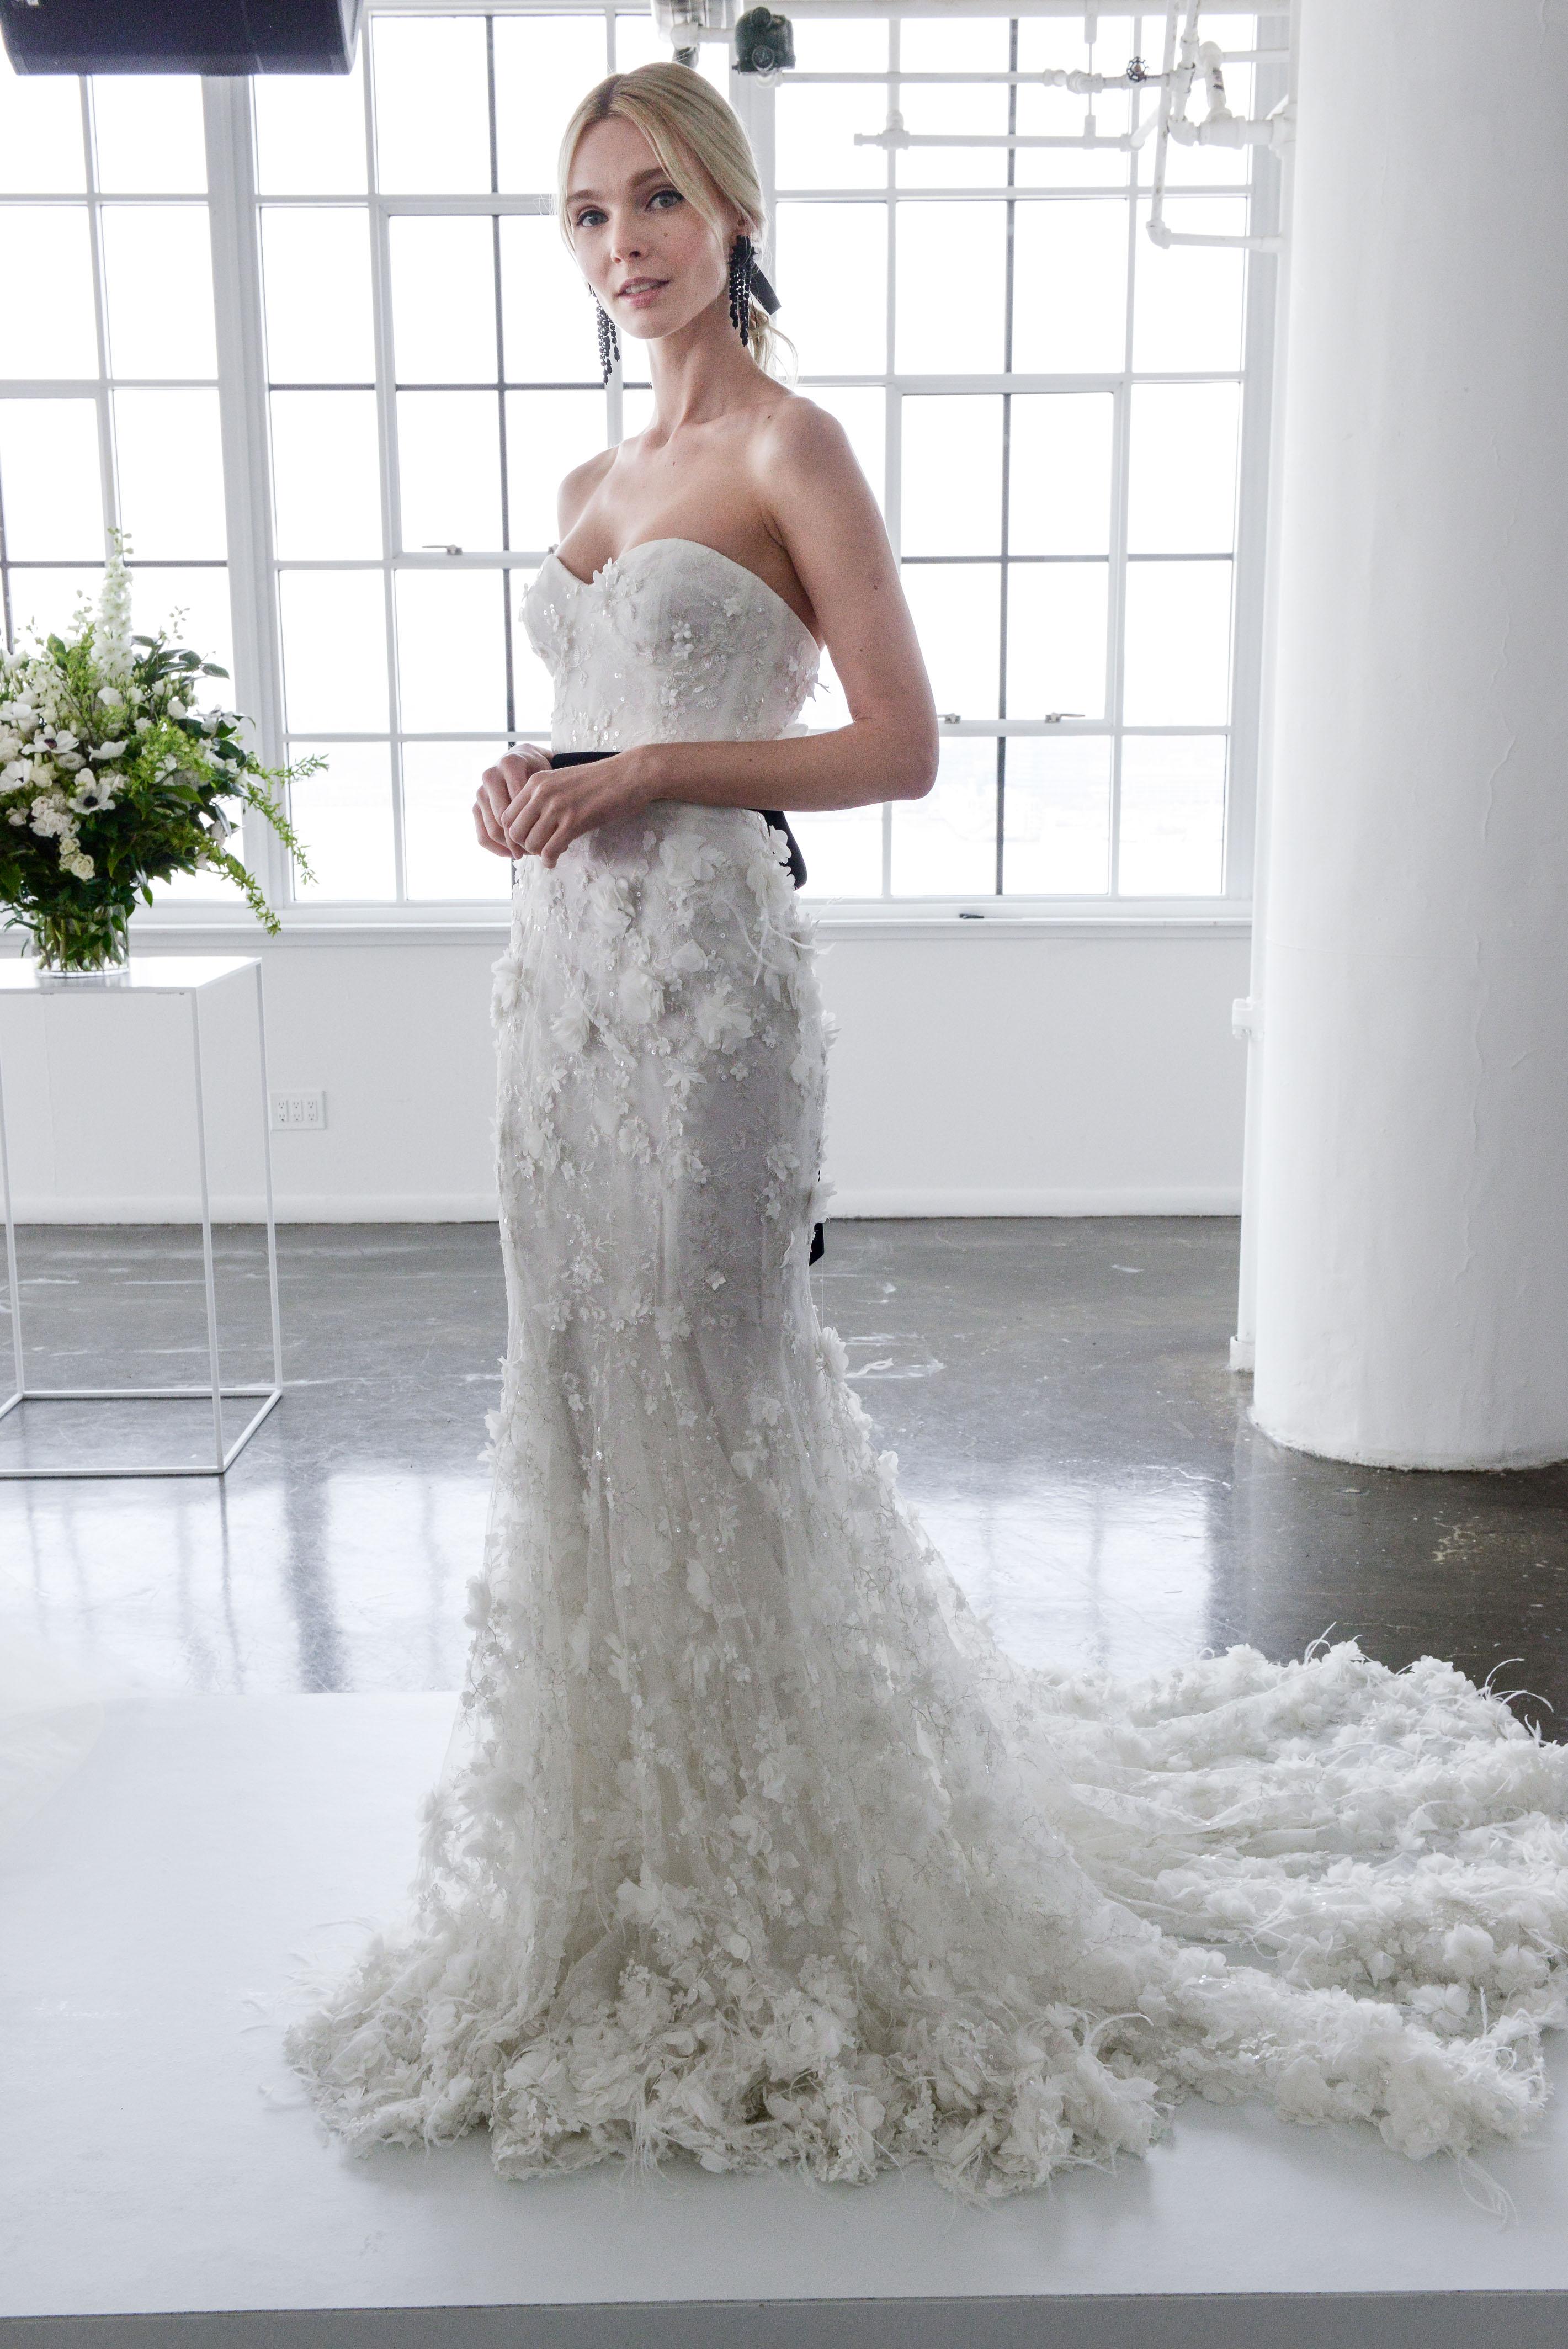 marchesa spring 2018 strapless wedding dress with three-dimensional details